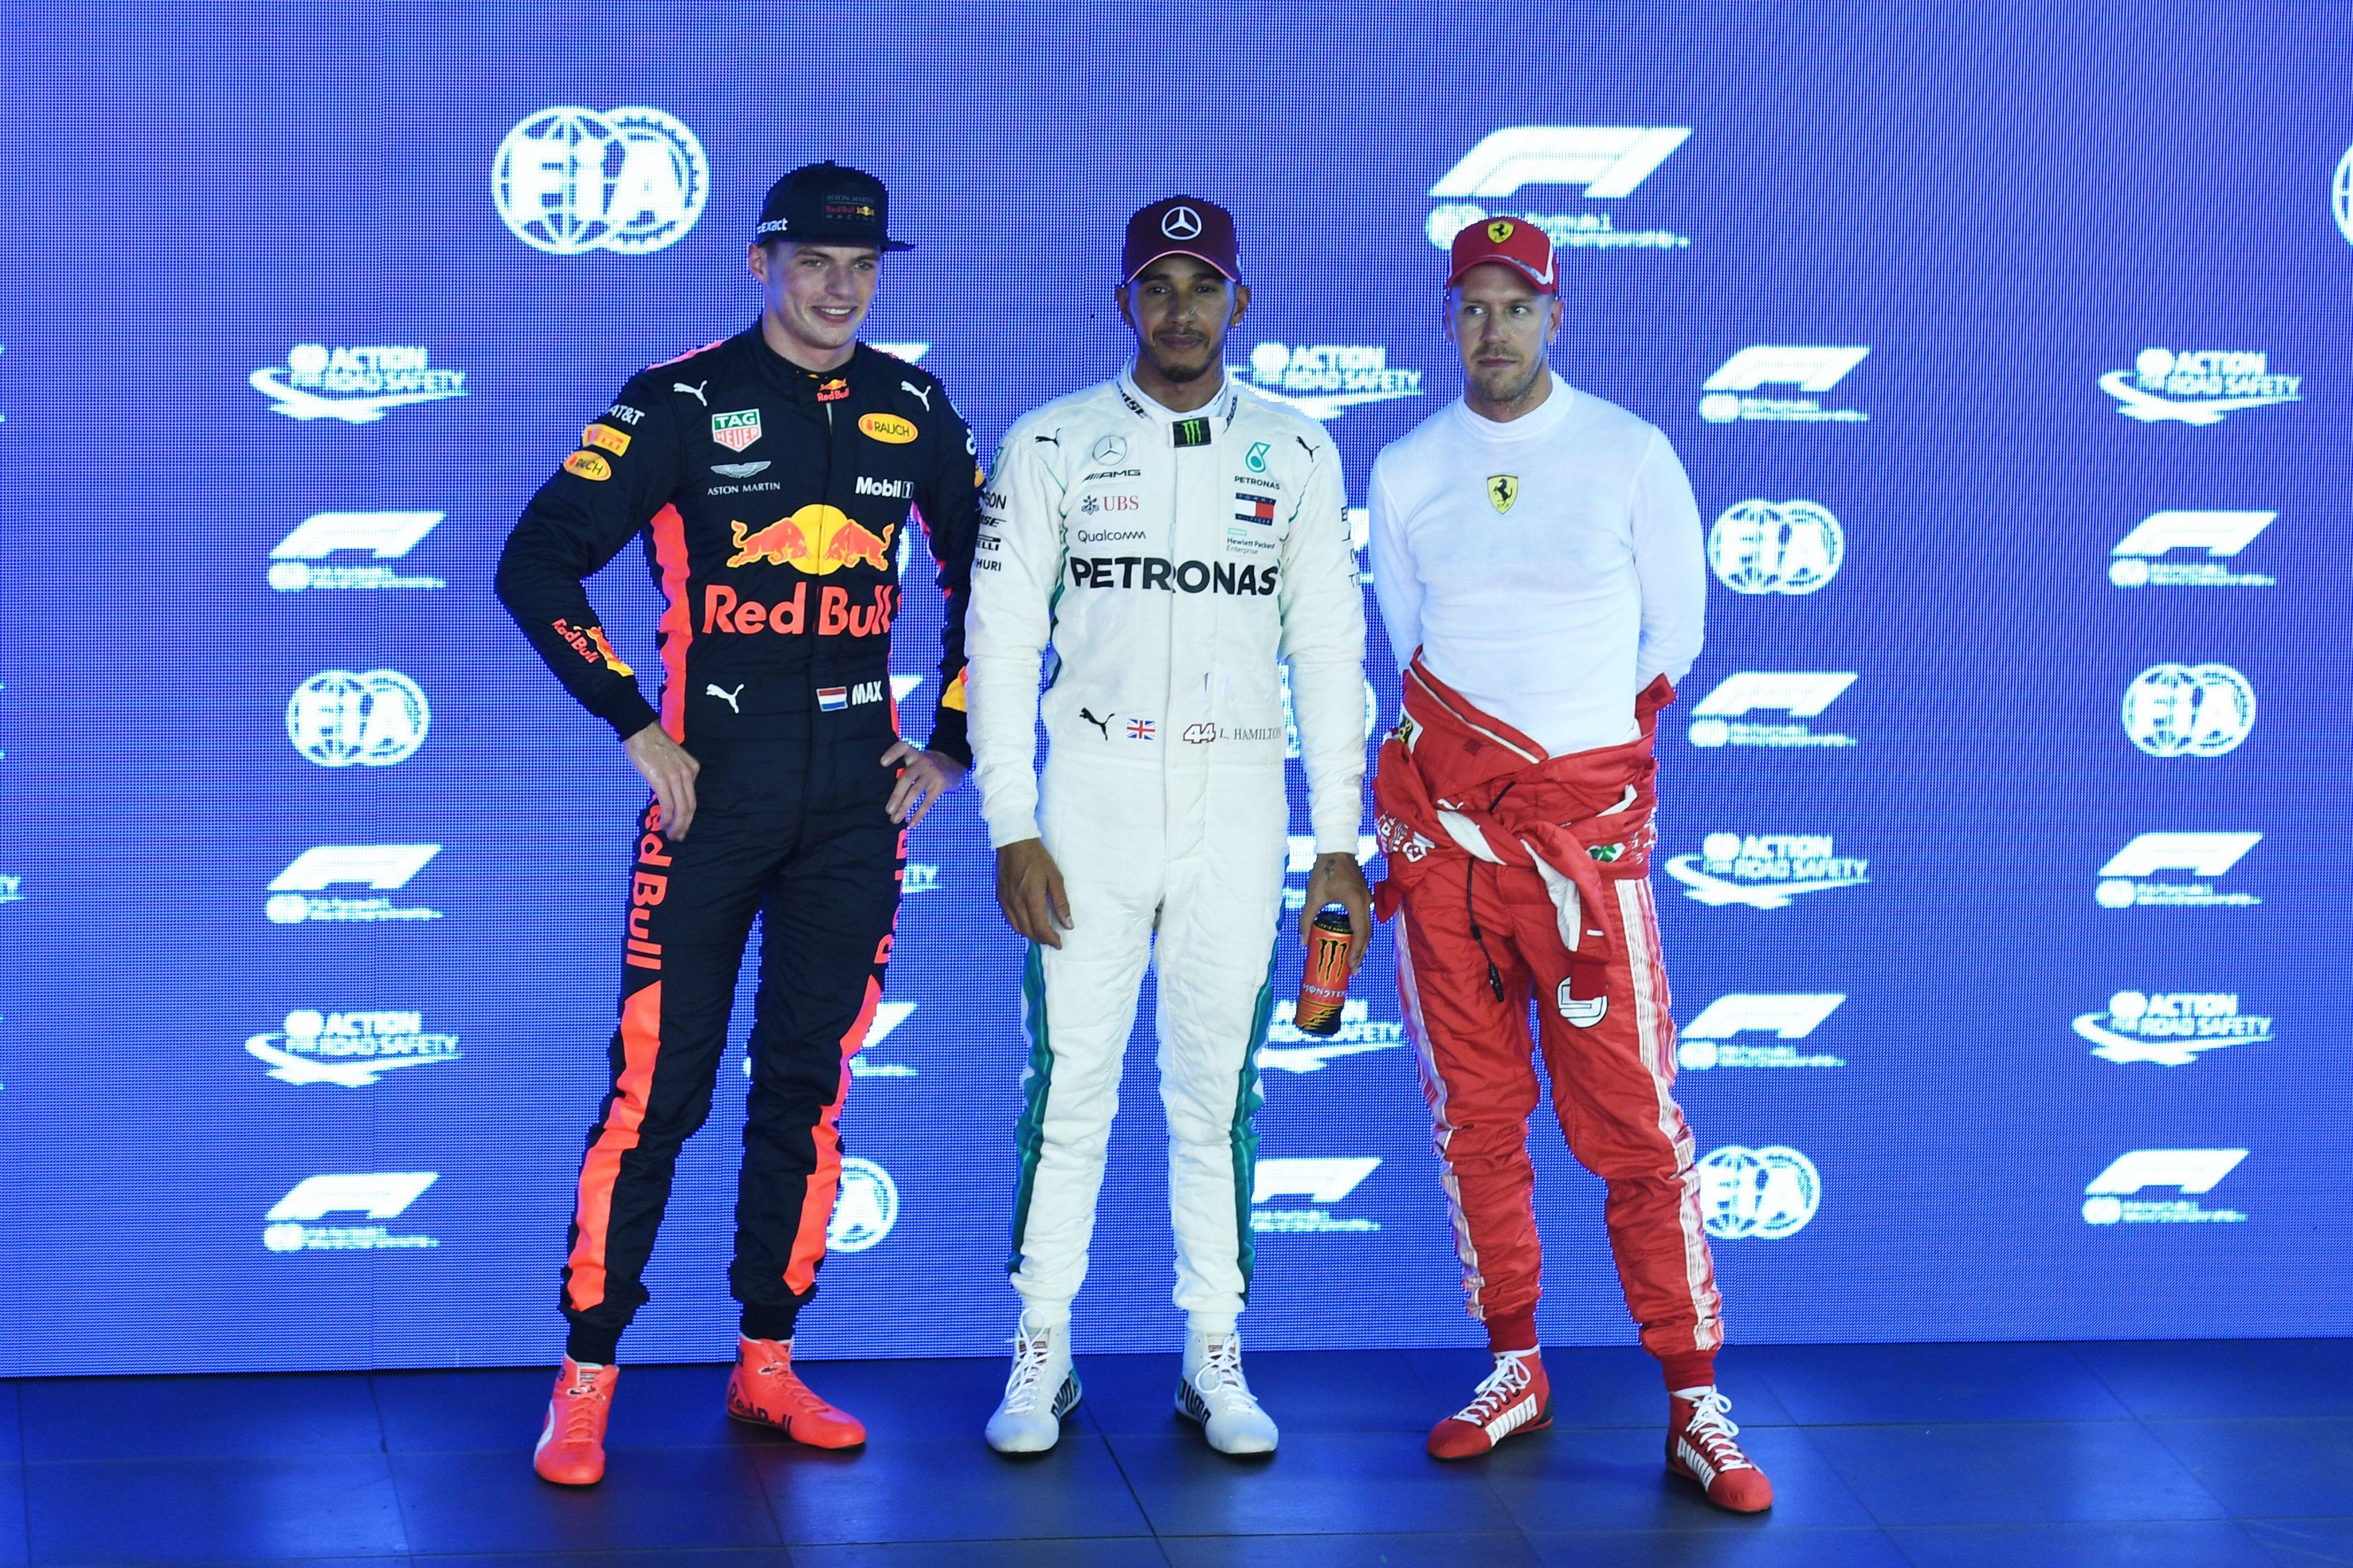 Lewis Hamilton (Mercedes), Max Verstappen (Red Bull) et Sebastian Vettel (Ferrari) au Grand Prix de Singapour 2018